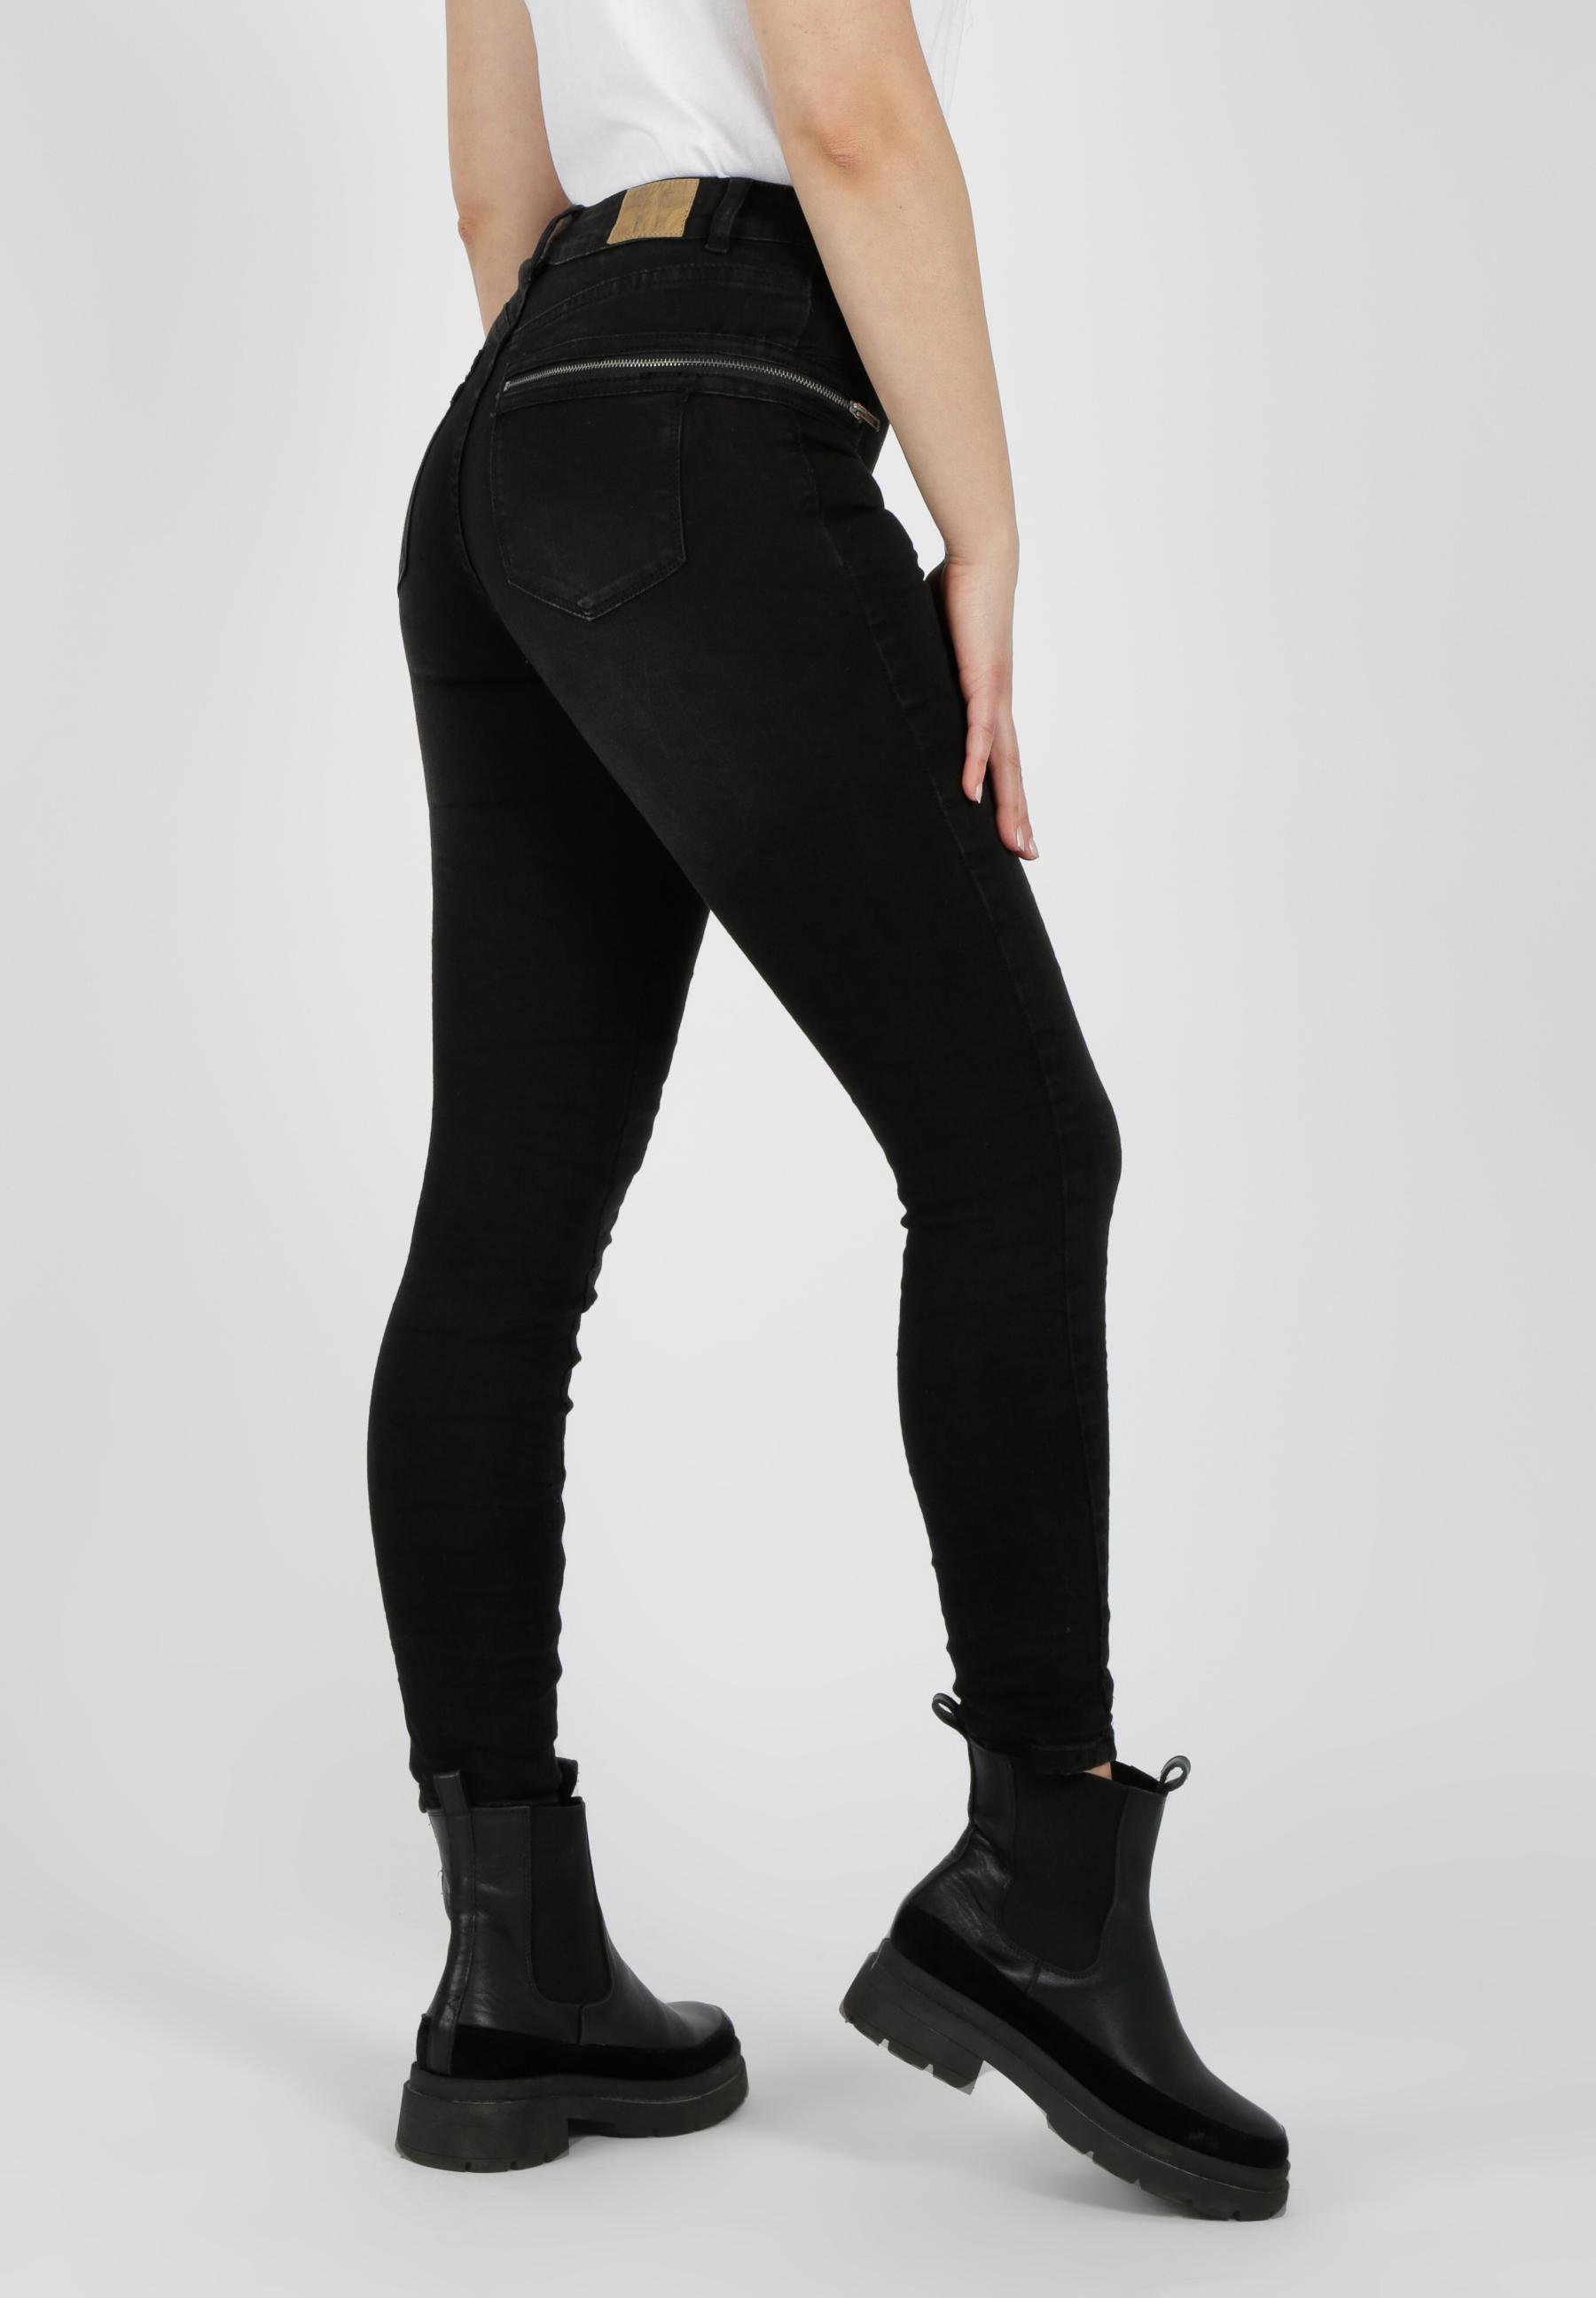 MiaZAYA Jeans Reisverschluss